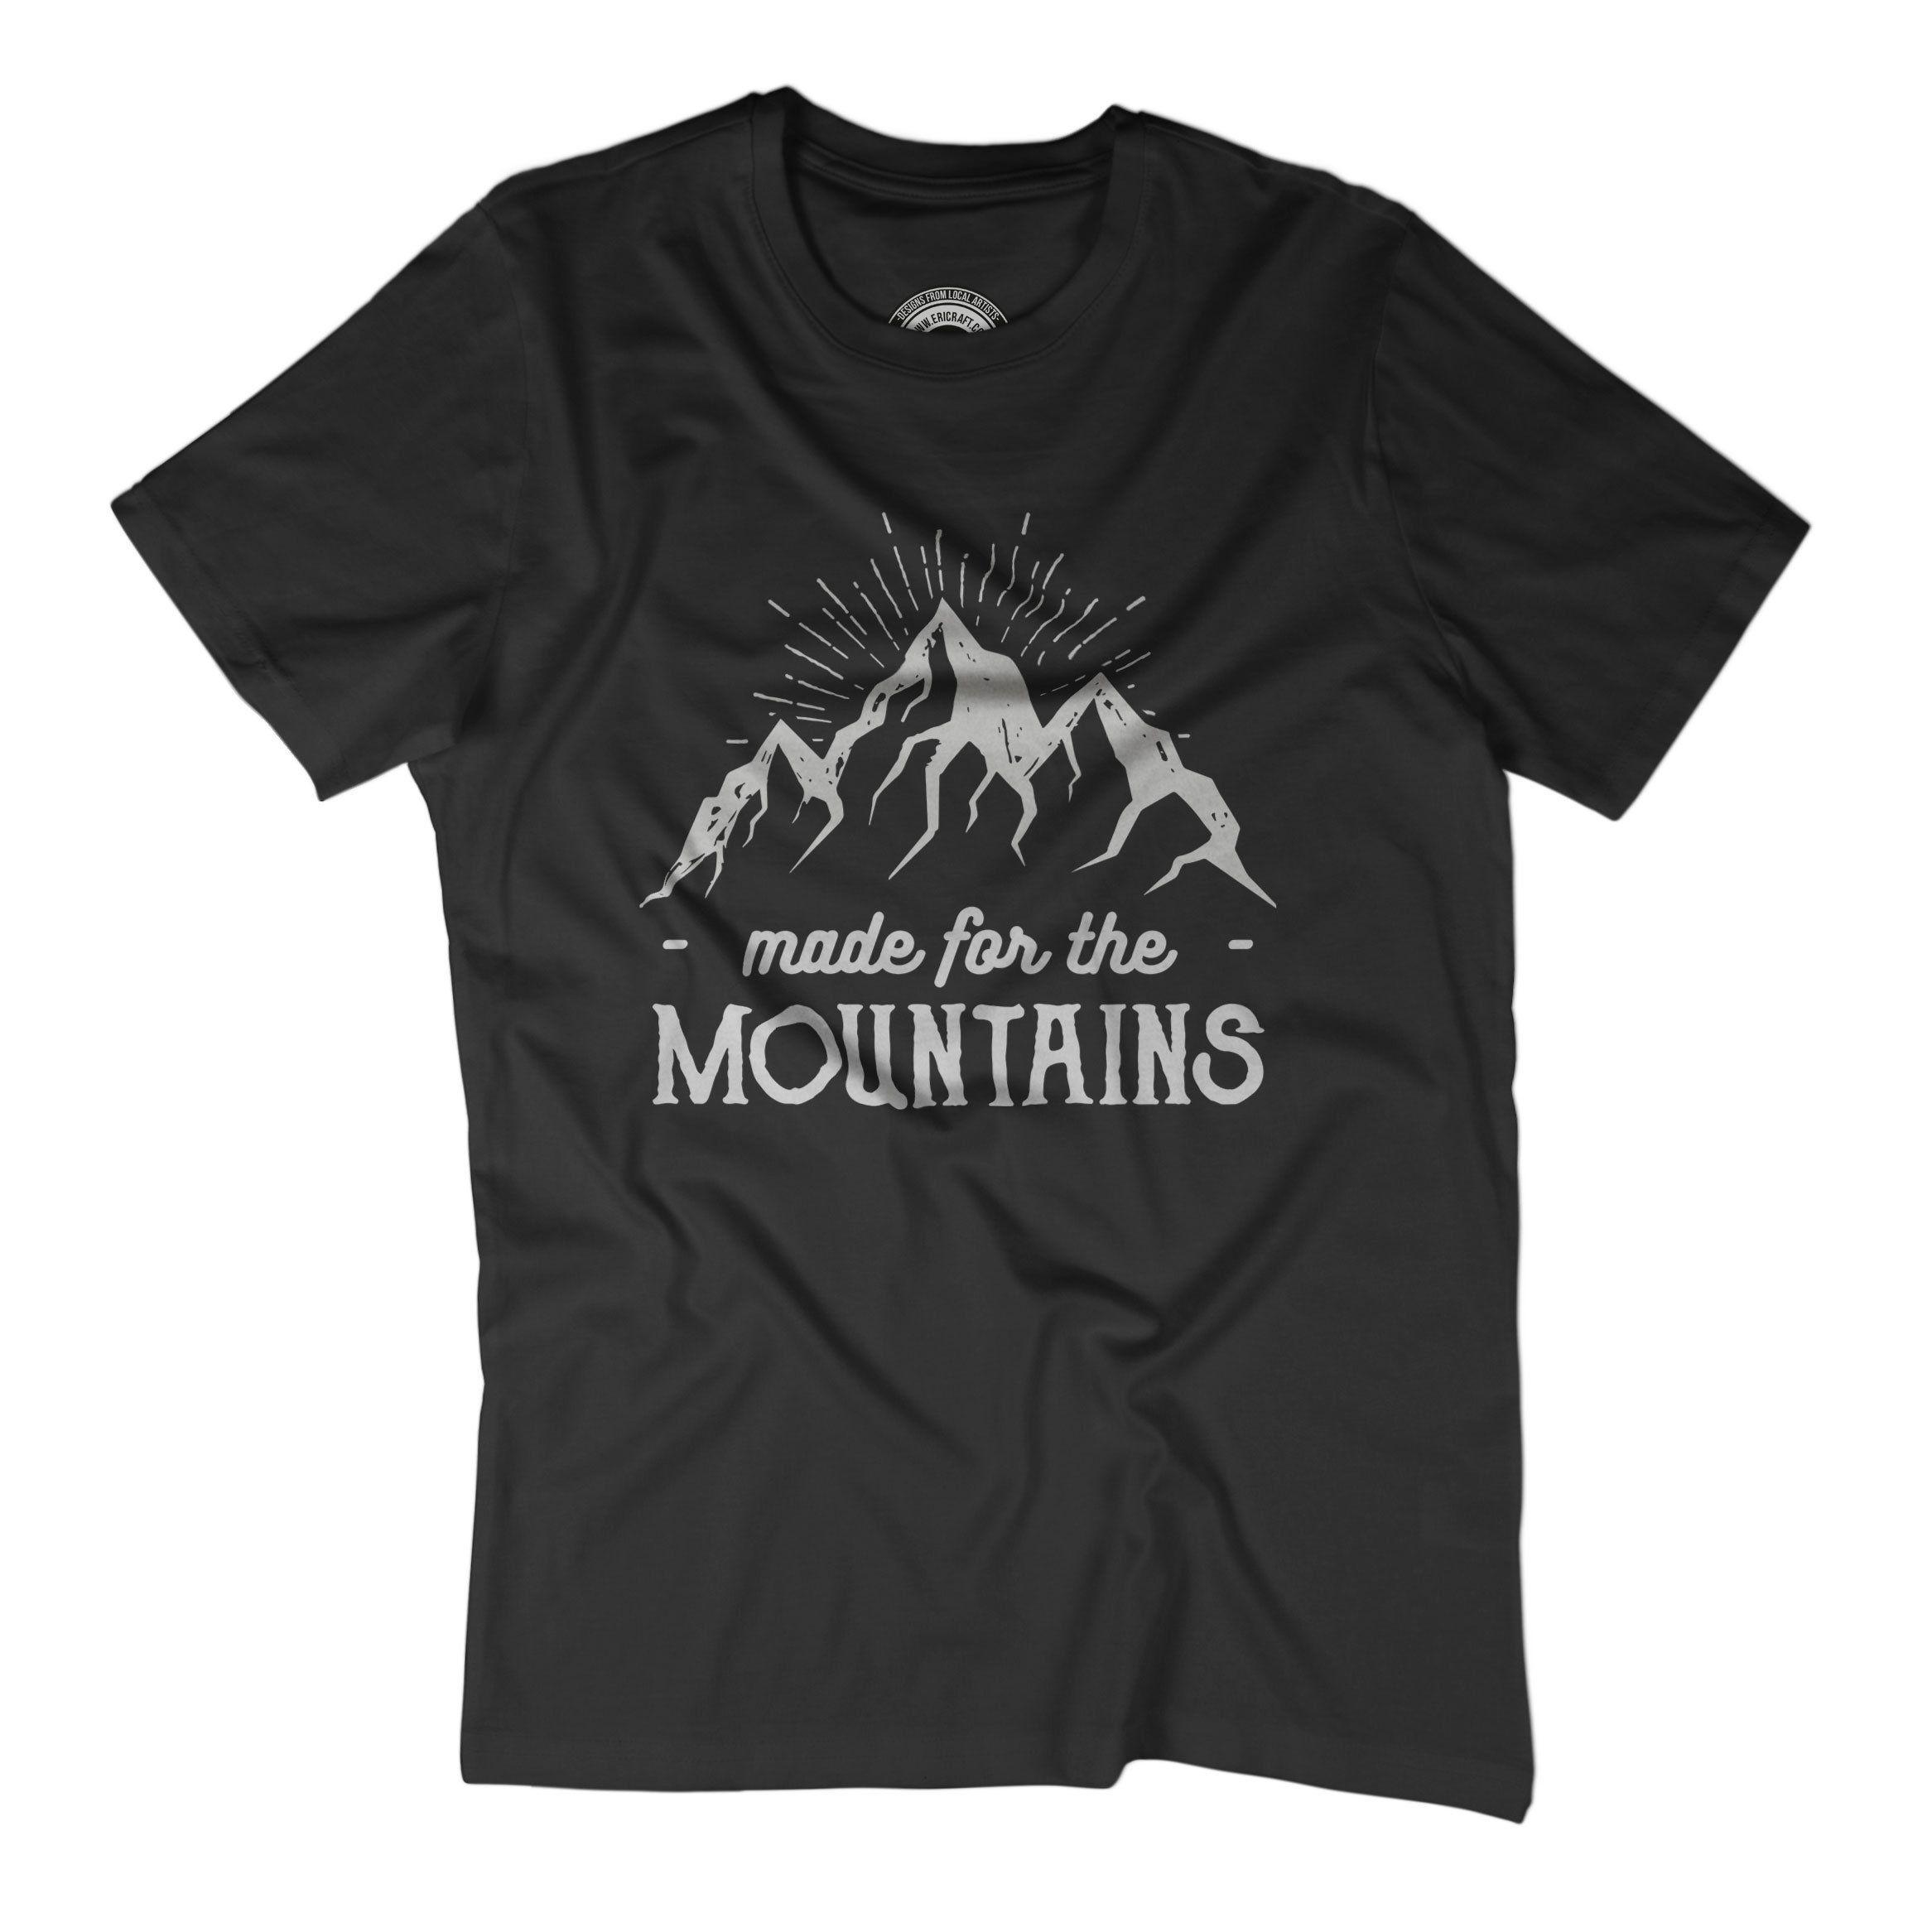 HIKING SHIRT Made for the mountains t-shirt Mountains are calling Nature t- shirt Graphic t shirt Mens minimalist nature shirt Pen art APV366